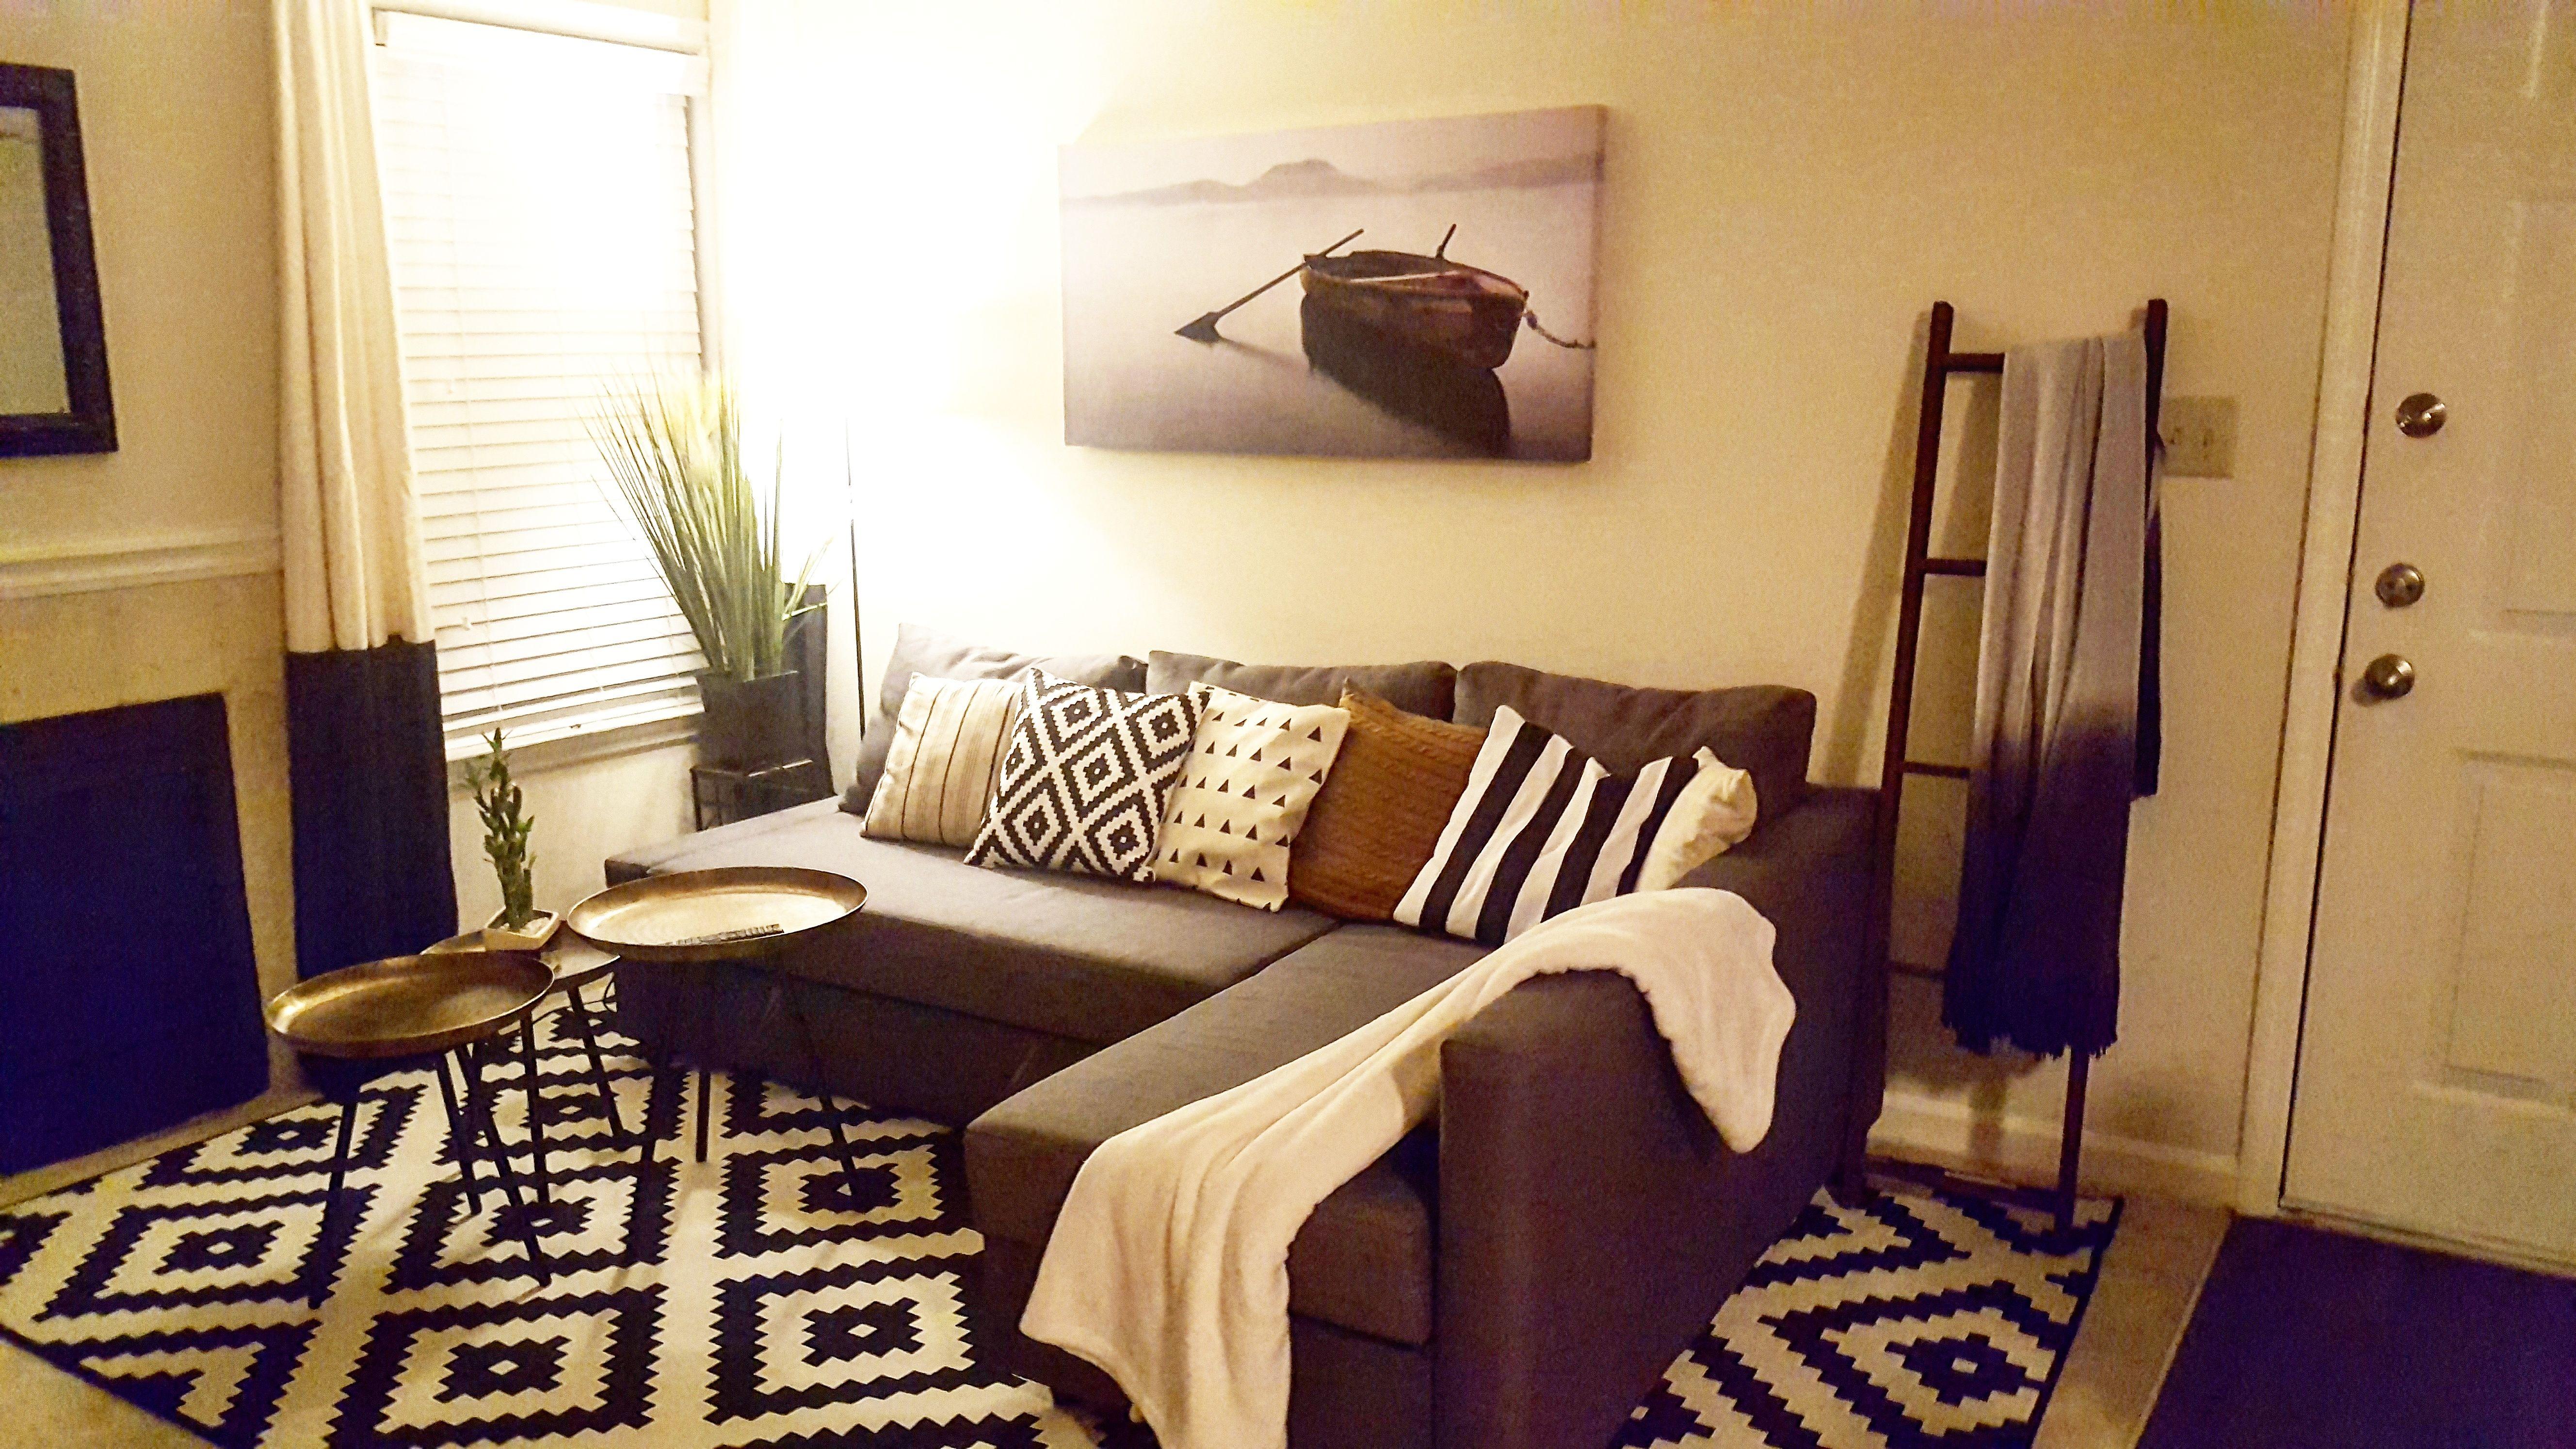 Ikea friheten sleeper sectional 3 seat skiftebo grey apartment decor chambre ami living - Deco chambre ikea ...